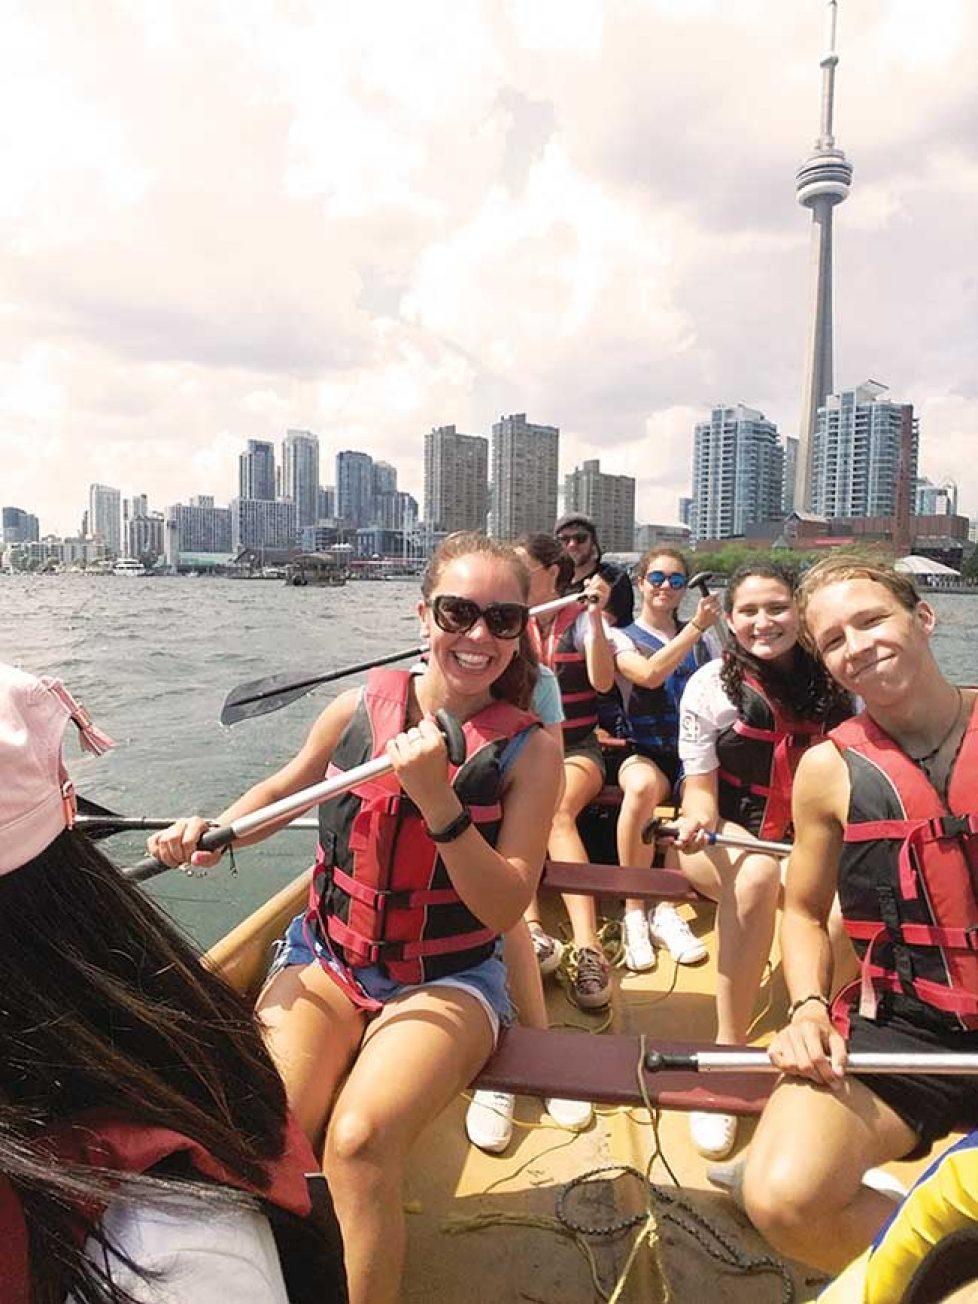 Verano Canadá - ST. MICHAELS Centro de Toronto